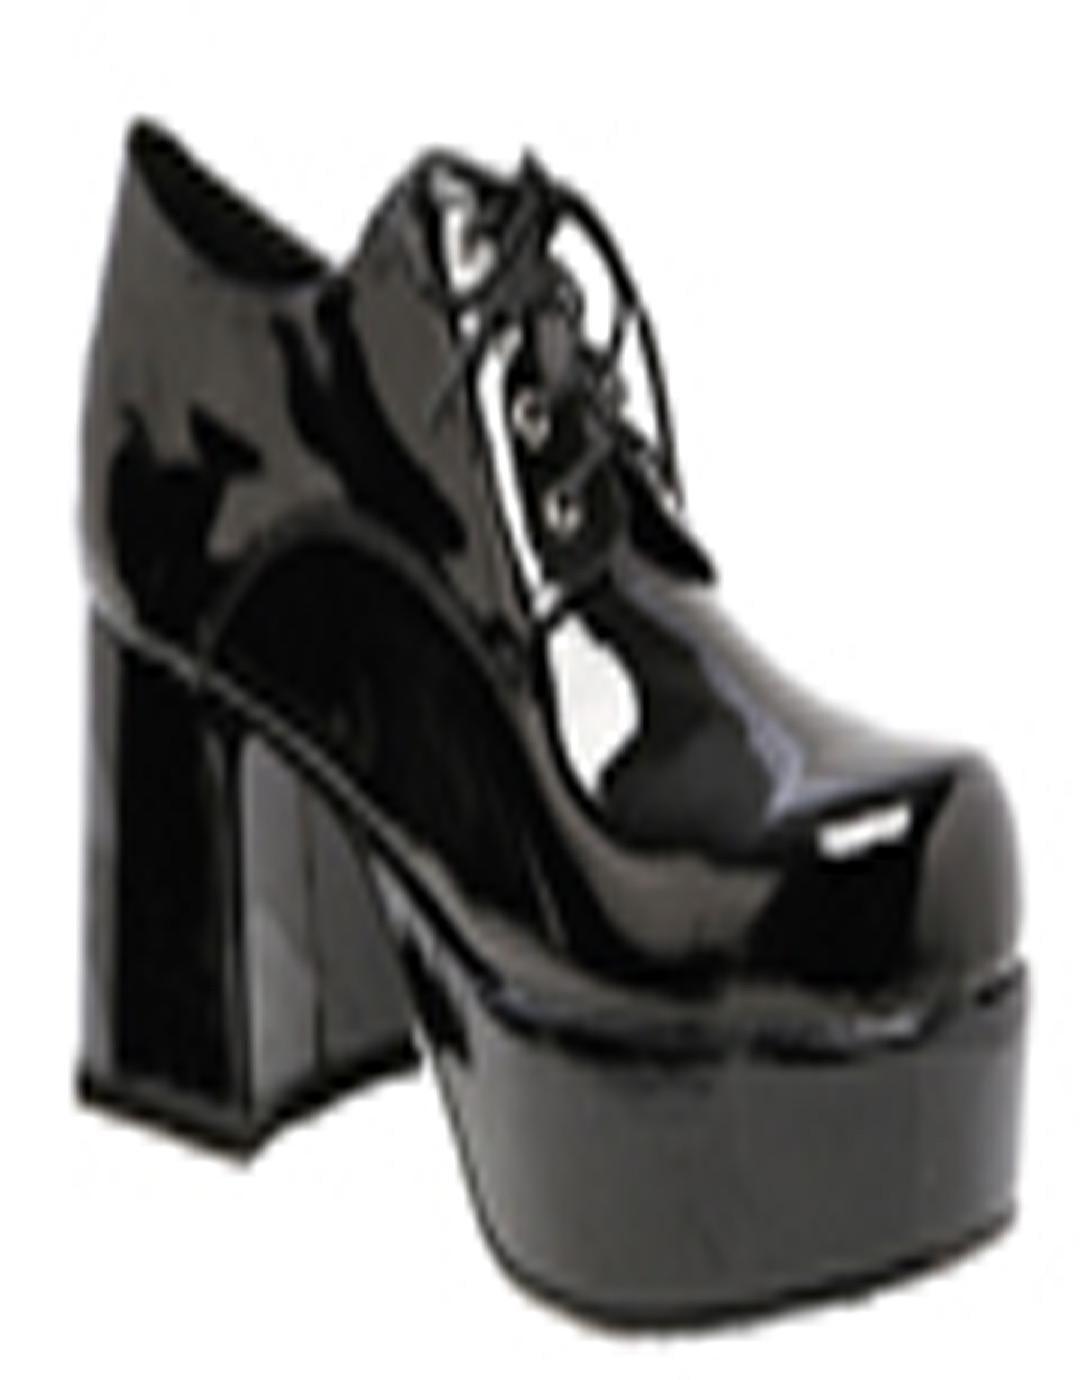 Shoe Platform Blk Pat Men Lg | Walmart